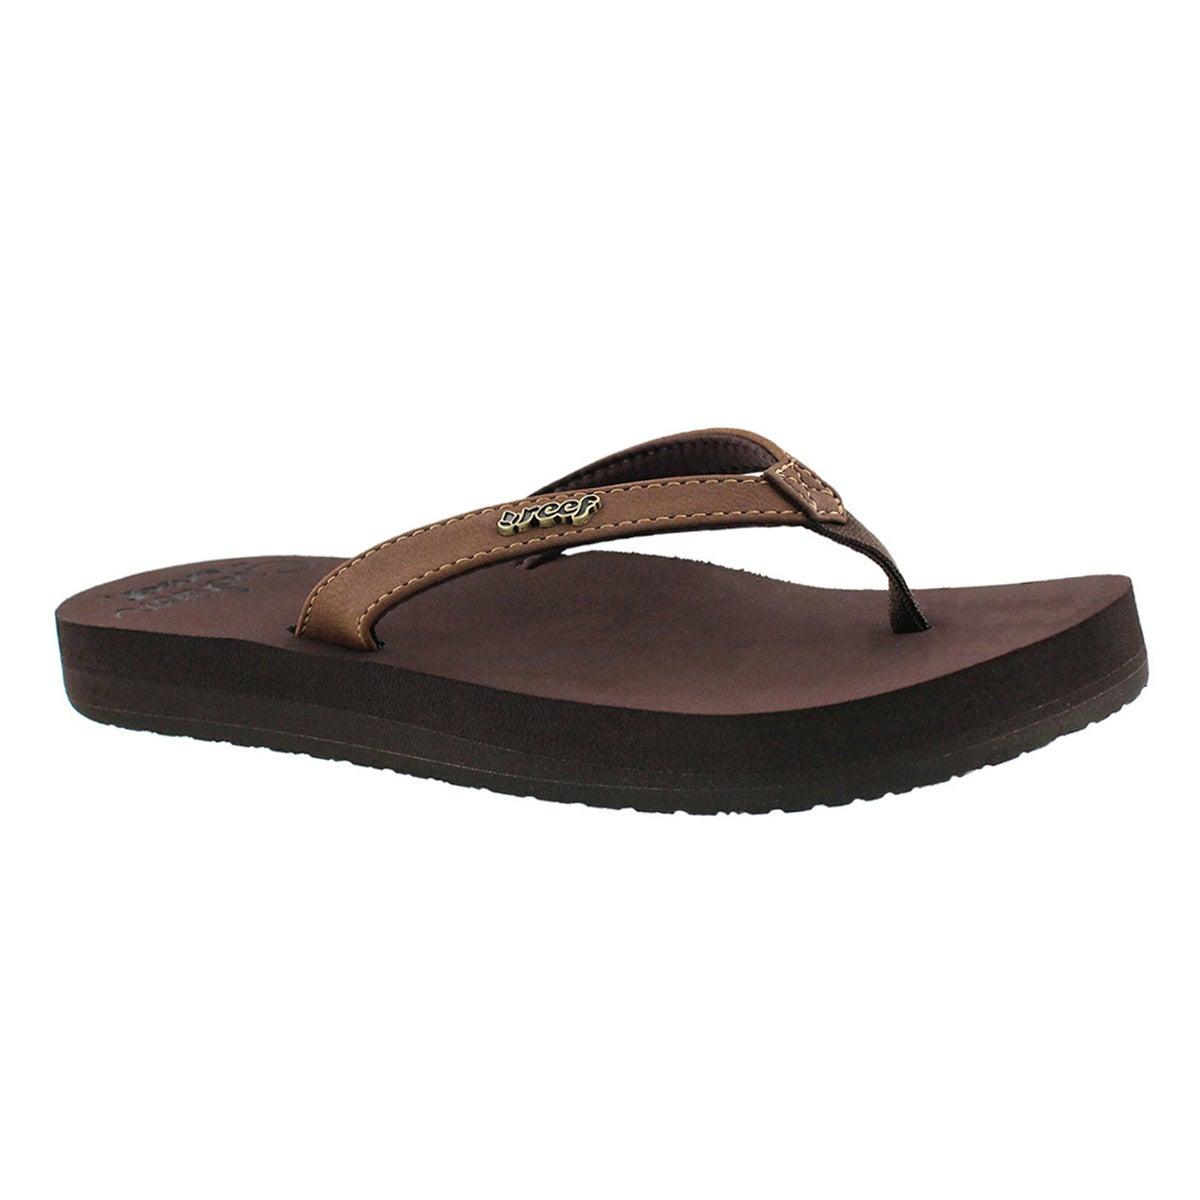 Women's CUSHION LUNA brown flip flops